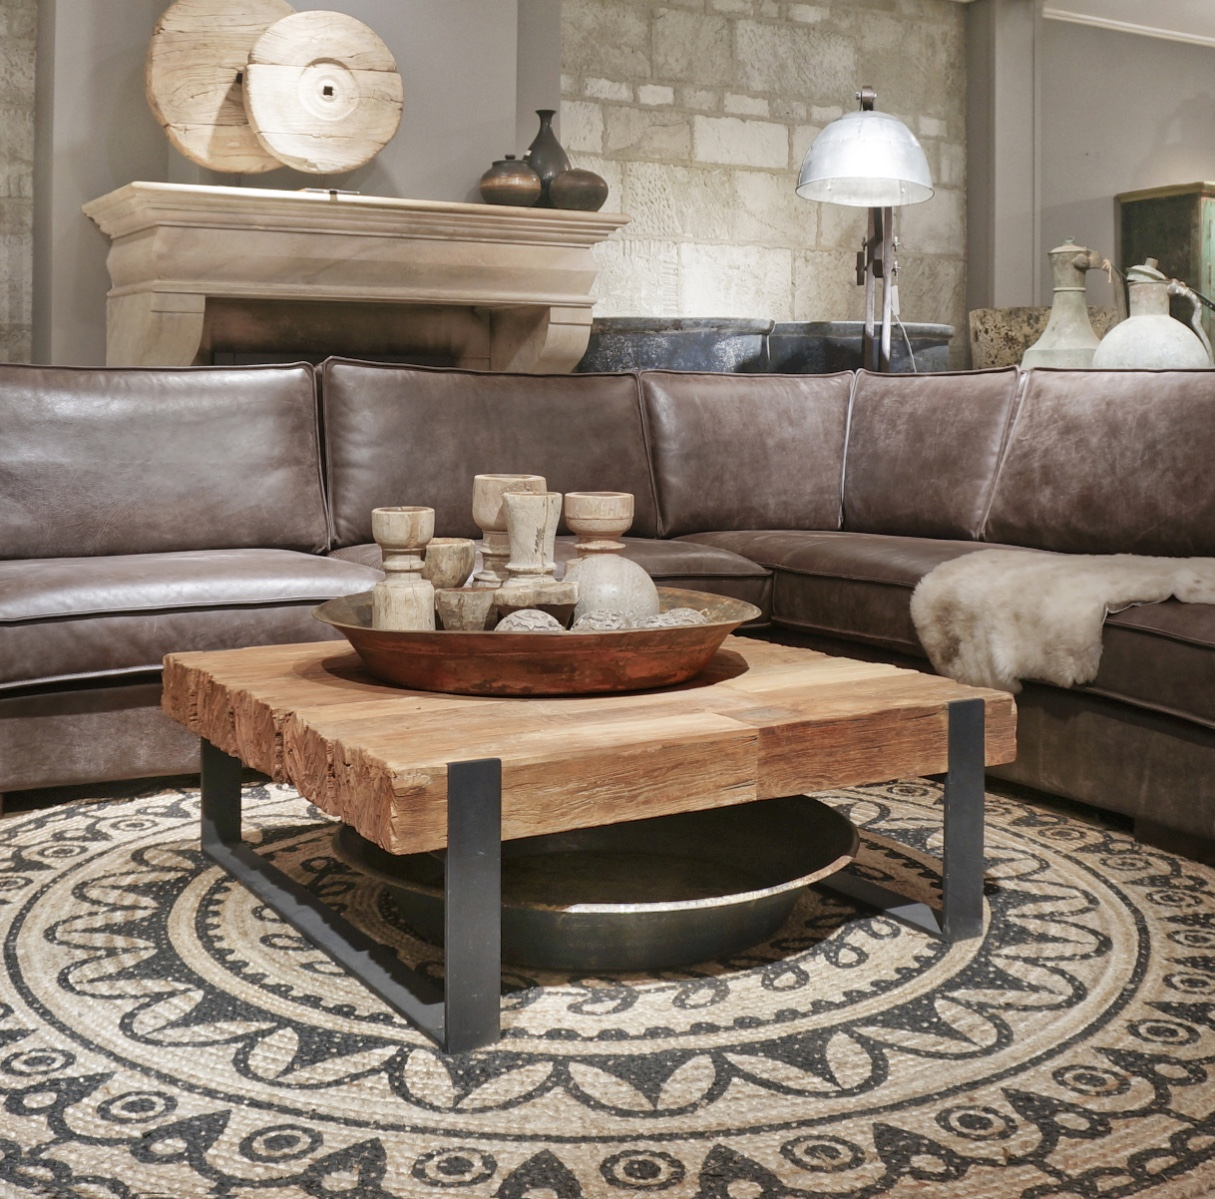 salontafel bigboy 100 x 100 kleinmeubelen collectie looiershuis. Black Bedroom Furniture Sets. Home Design Ideas